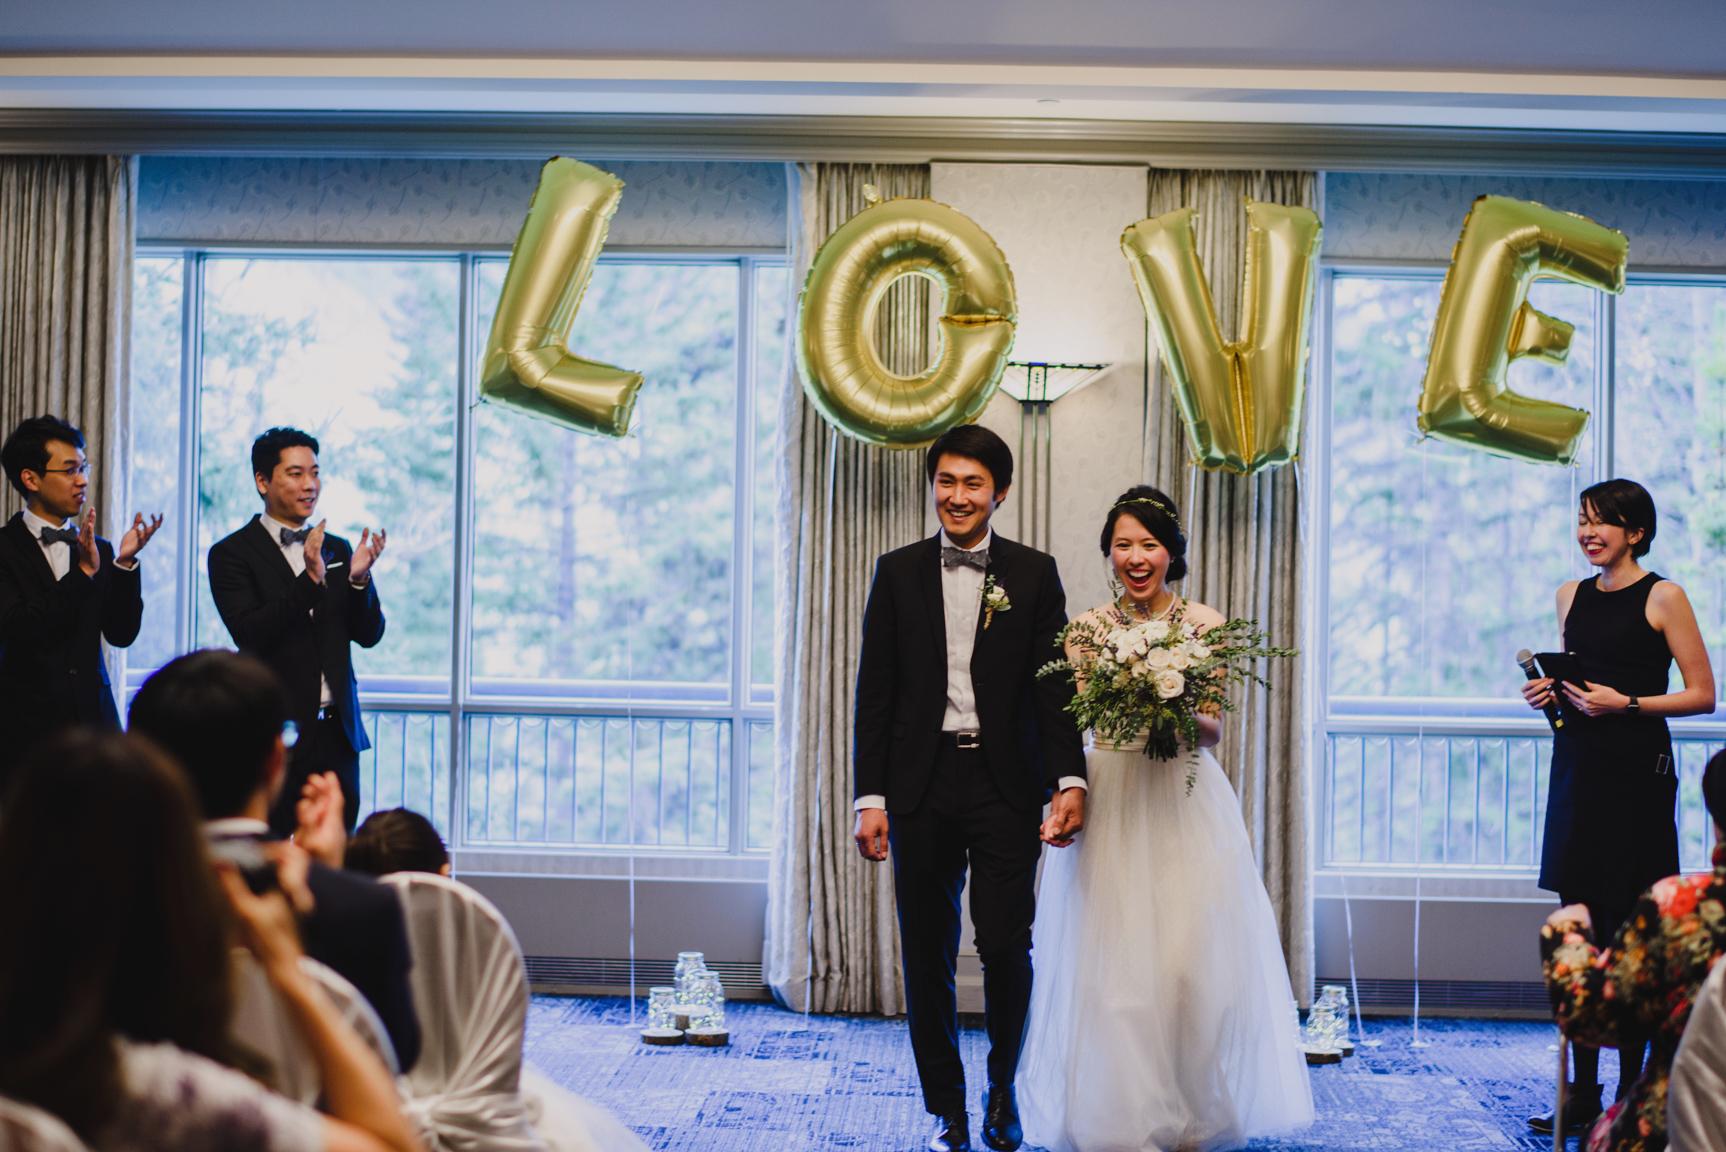 Banff-Wedding-Photography-MichaelChanPhotography43.JPG